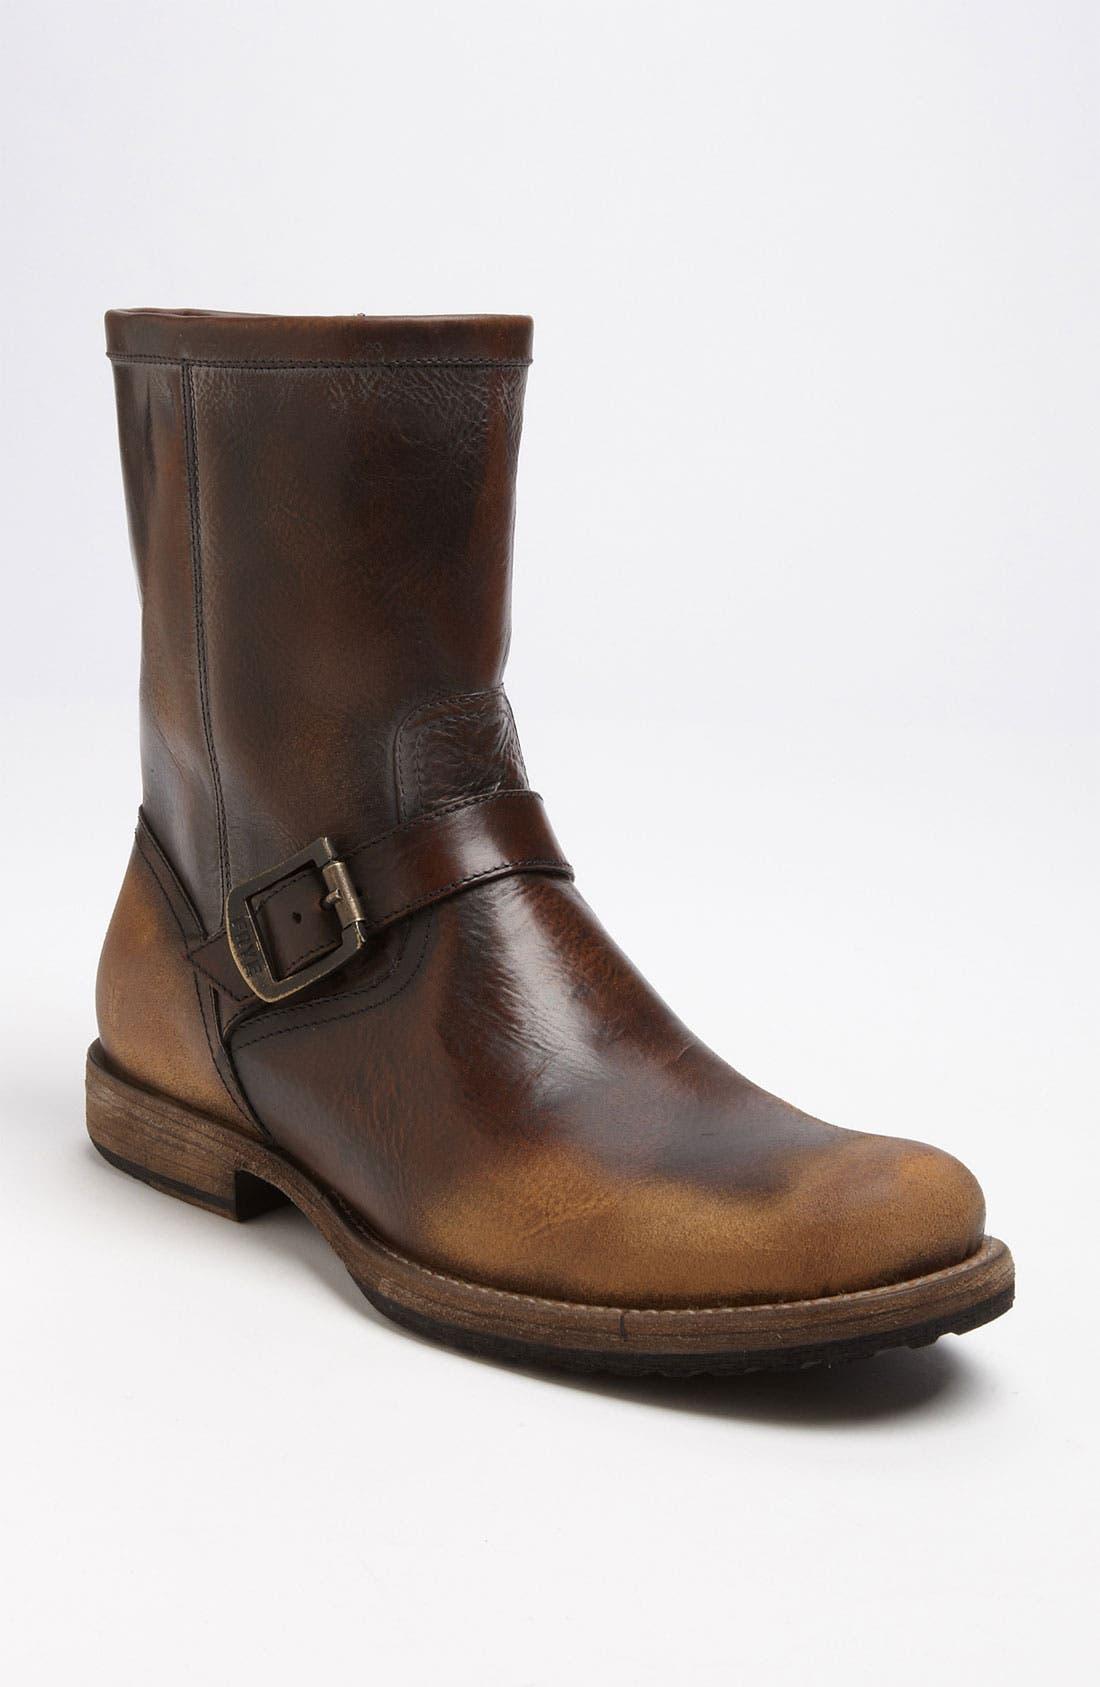 Alternate Image 1 Selected - Frye 'Phillip' Engineer Boot